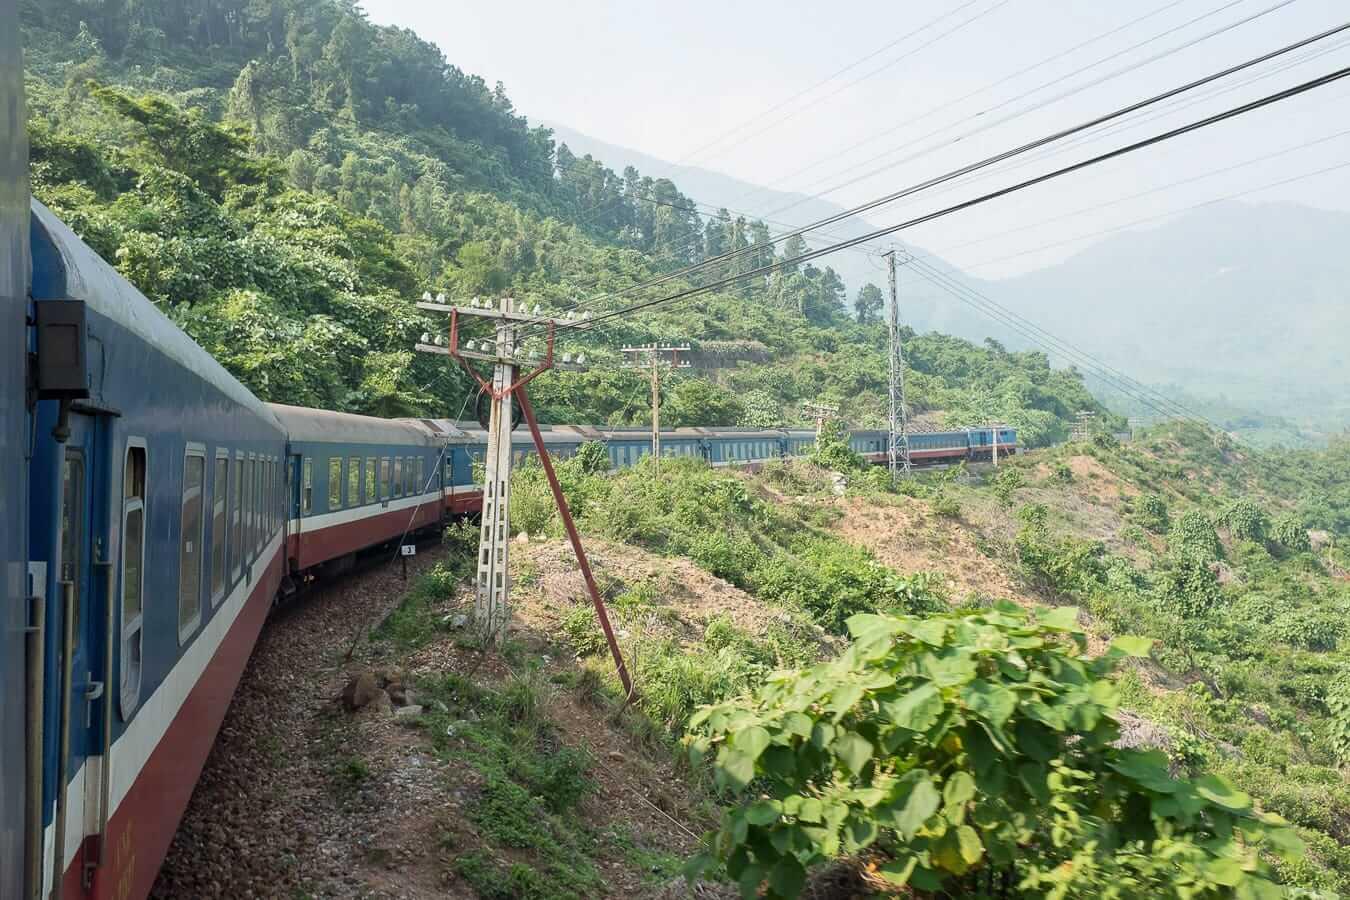 Reunification Express Train: Hanoi to Hoi An